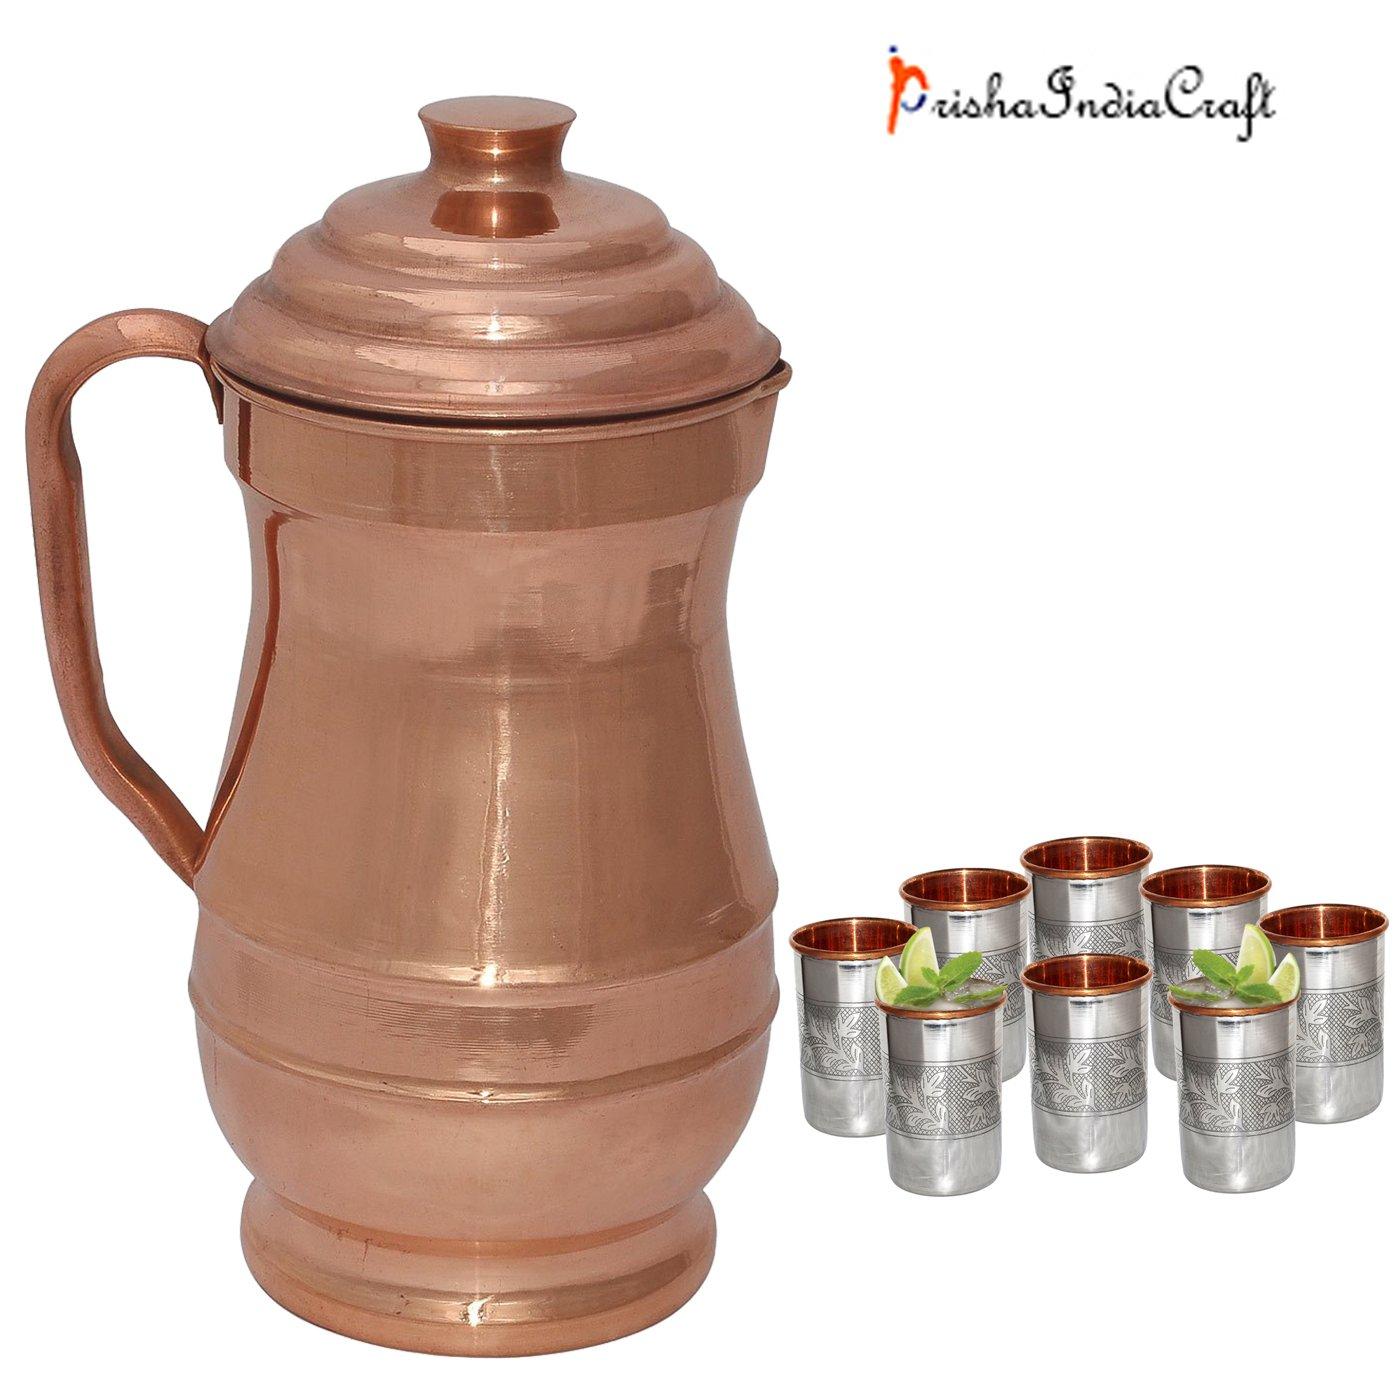 Prisha India Craft Pure Copper Jug ( MAHARAJA JUG 1900 ML / 64.25 oz ) with Eight (8) Glass Drinkware Set - Handmade Water Glasses - Traveller's Copper Cup for Ayurveda Benefits